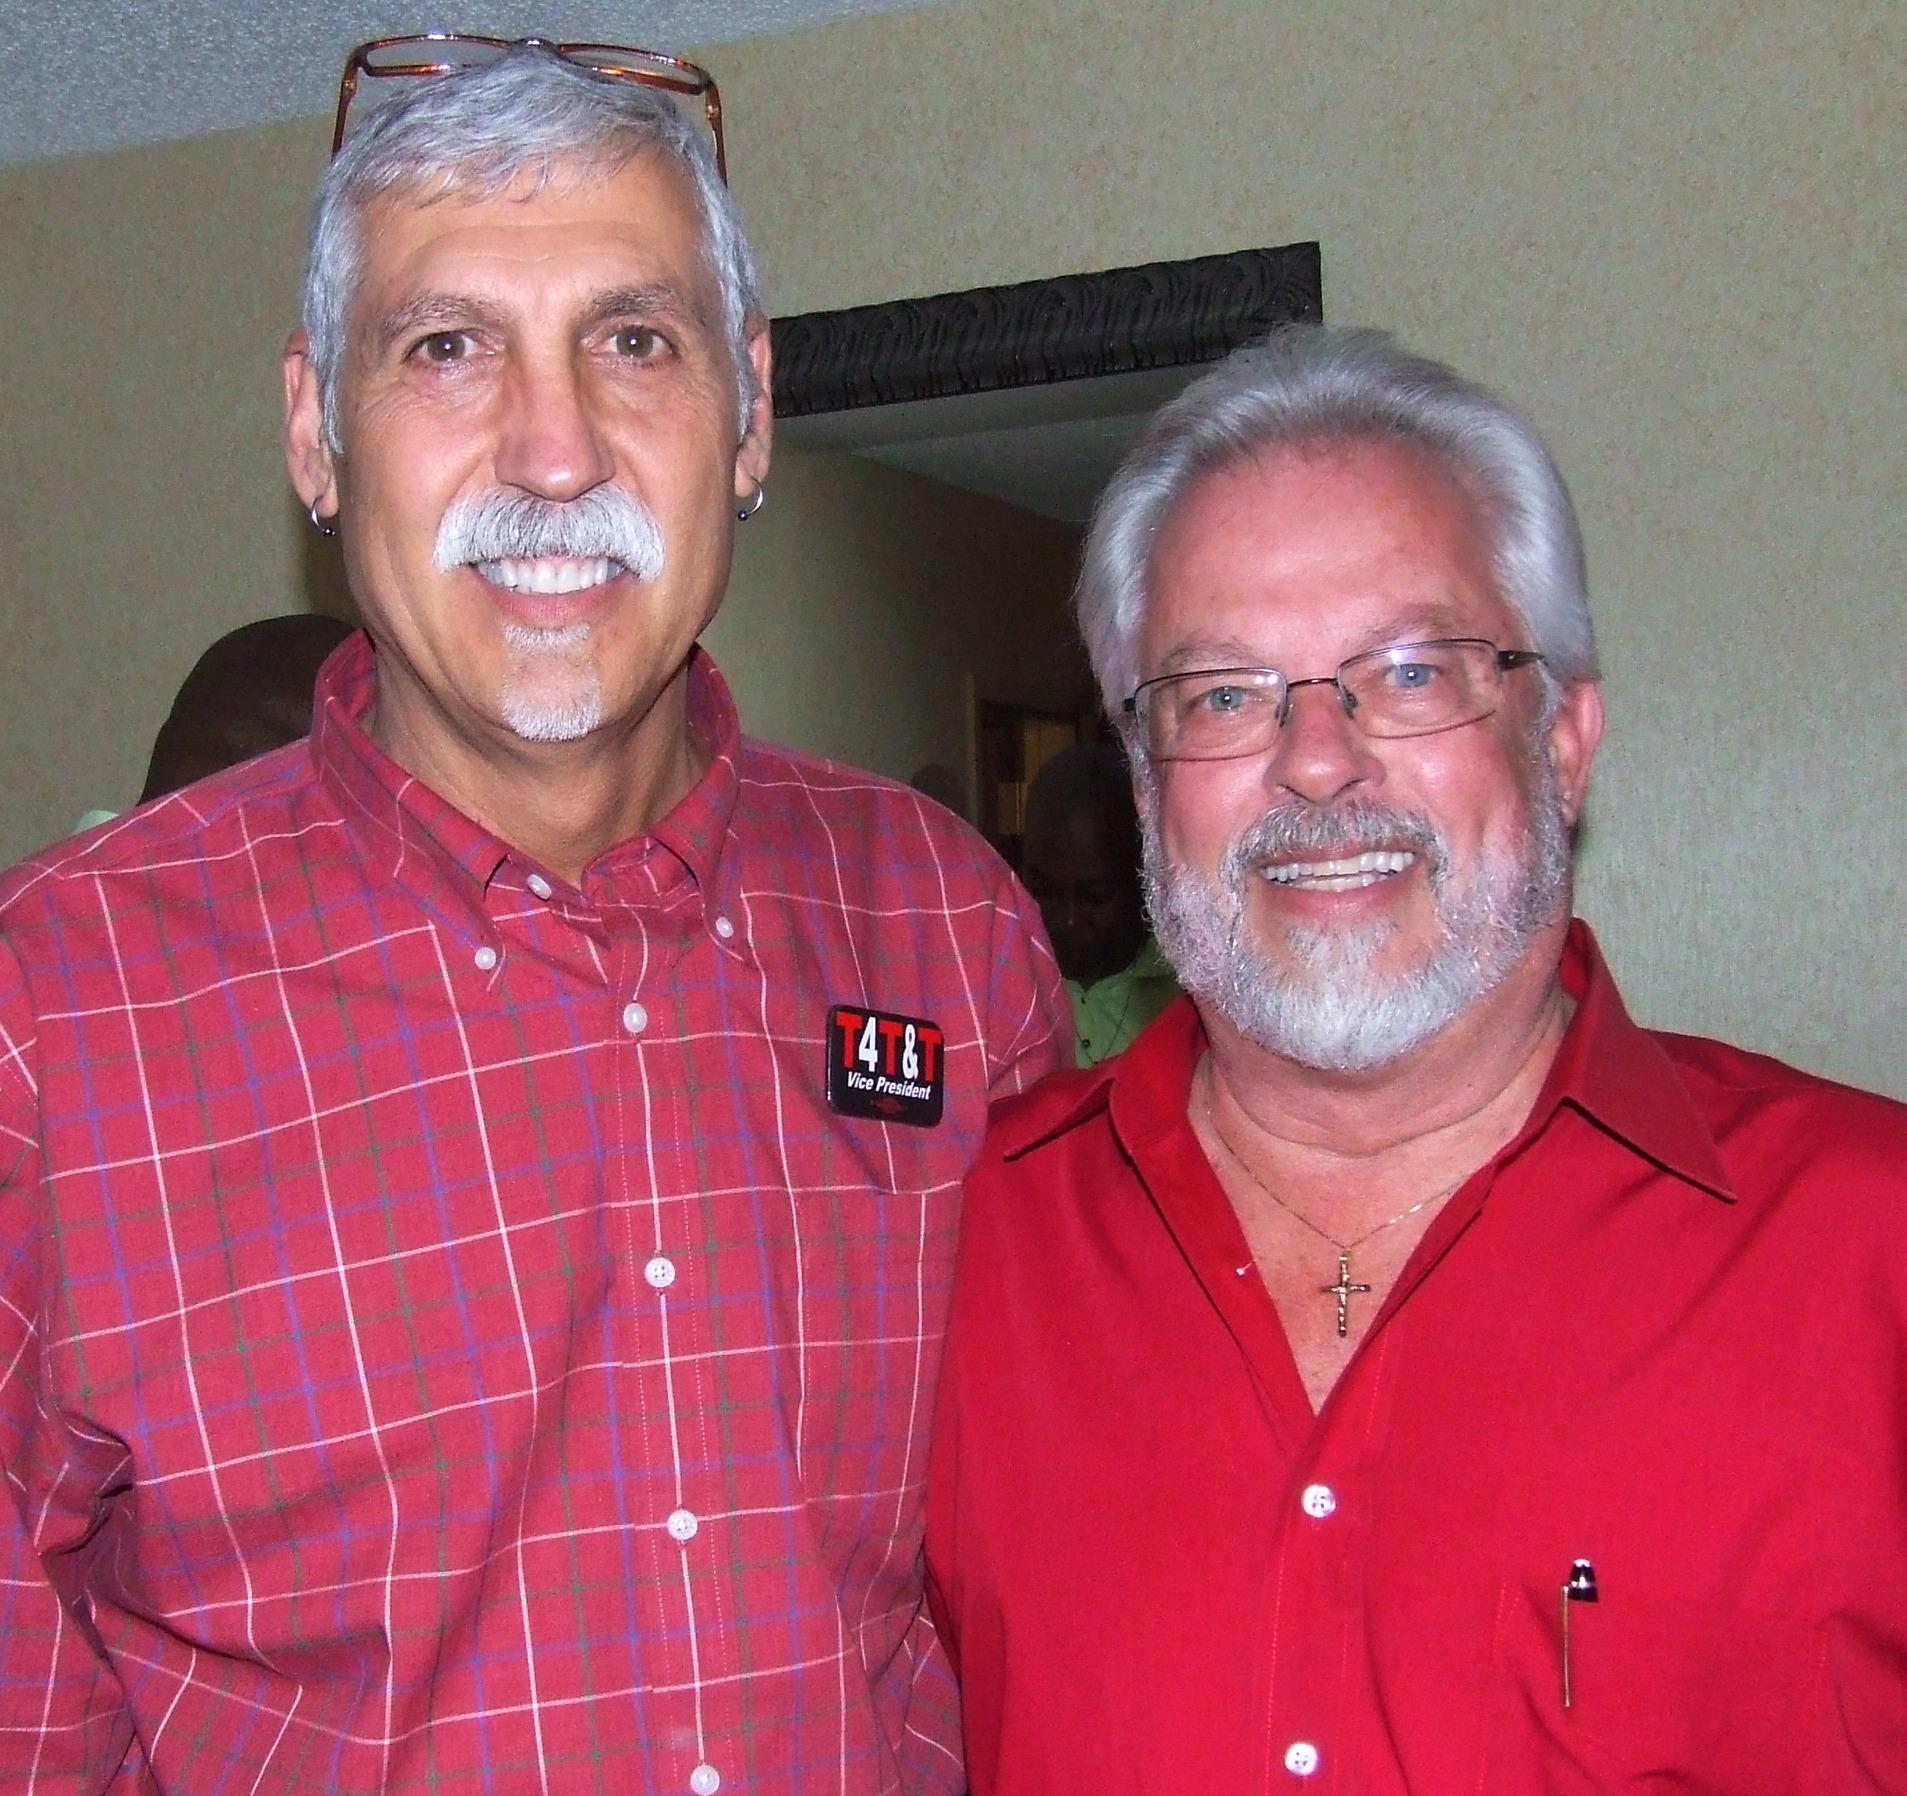 President Santora with D9 VP Tom Runnion